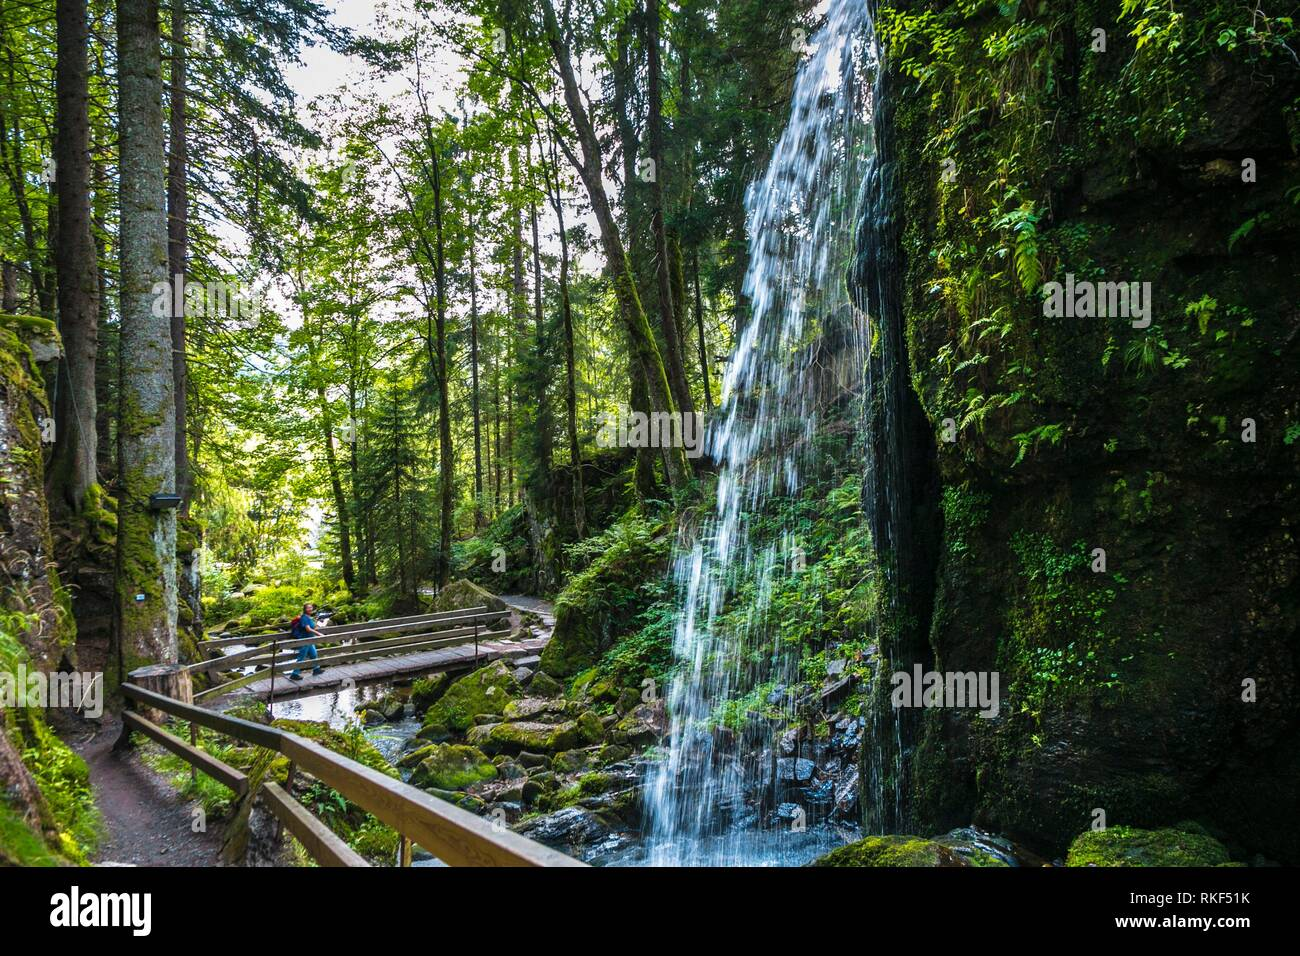 Waterfall. Menzenschwand. Black Forest. Baden Wurttemberg. Germany. Europe - Stock Image